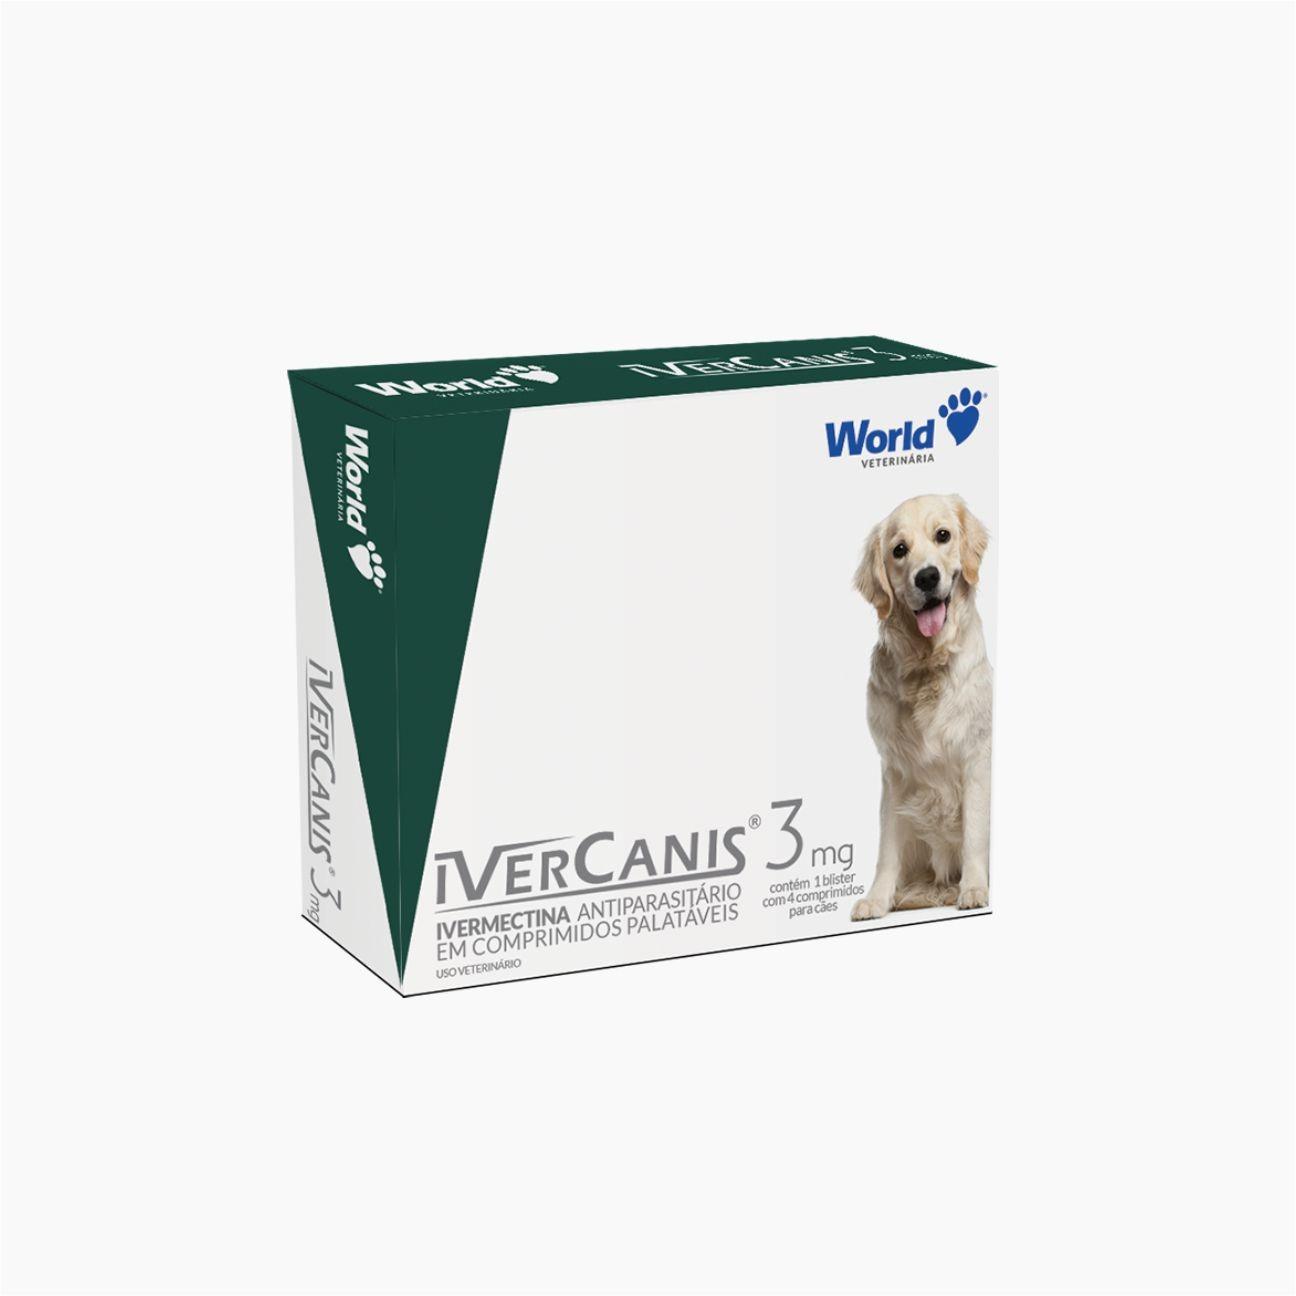 IverCanis 3mg